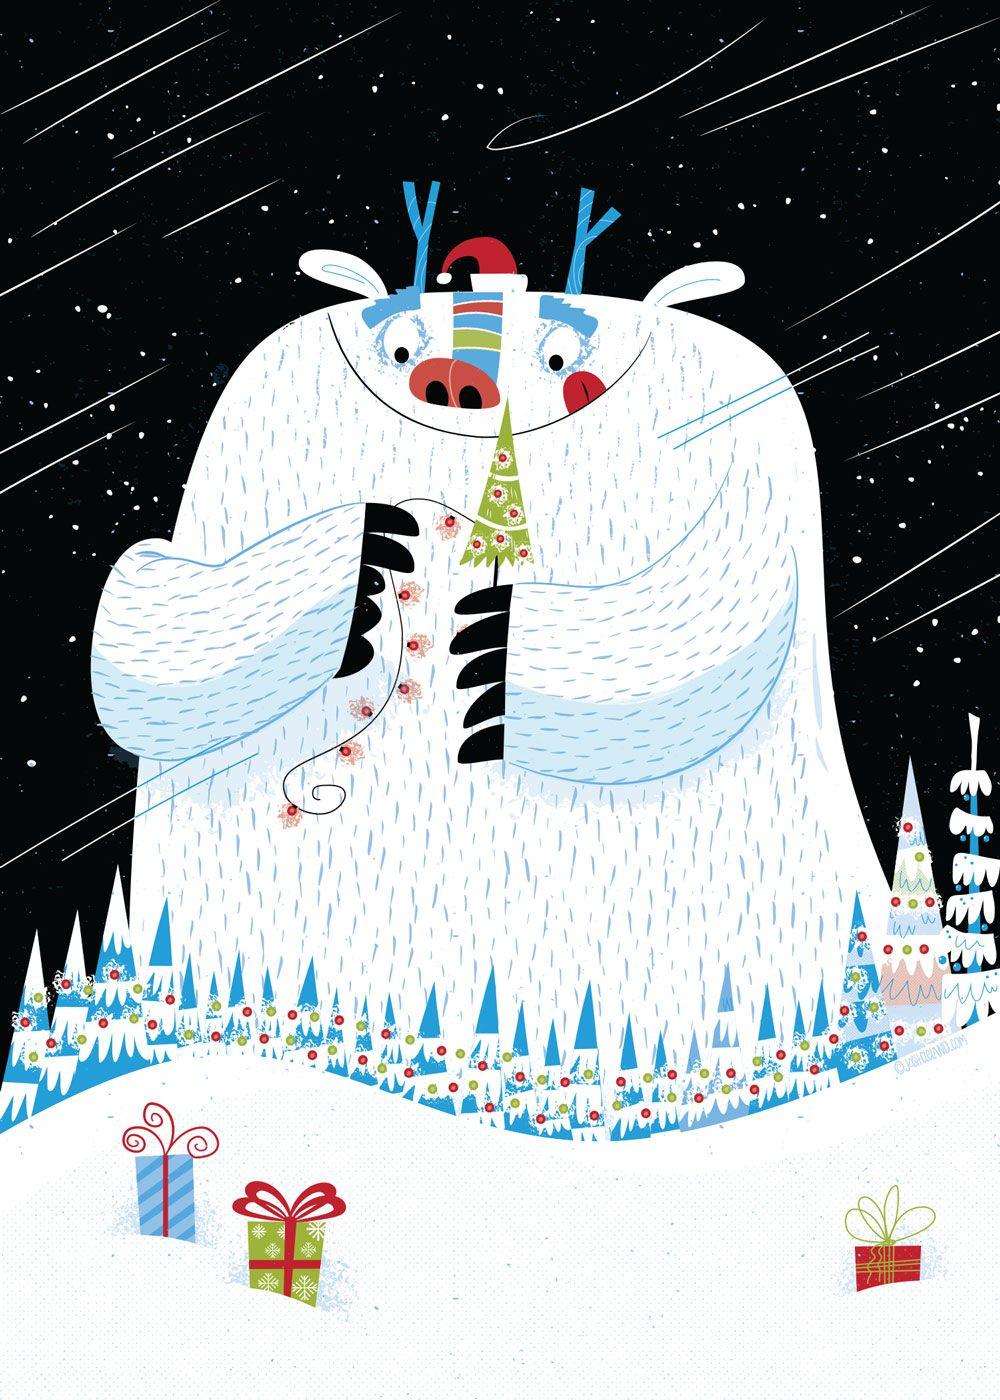 Christmas yeti greeting card by Josh Cleland | Christmas Card ...